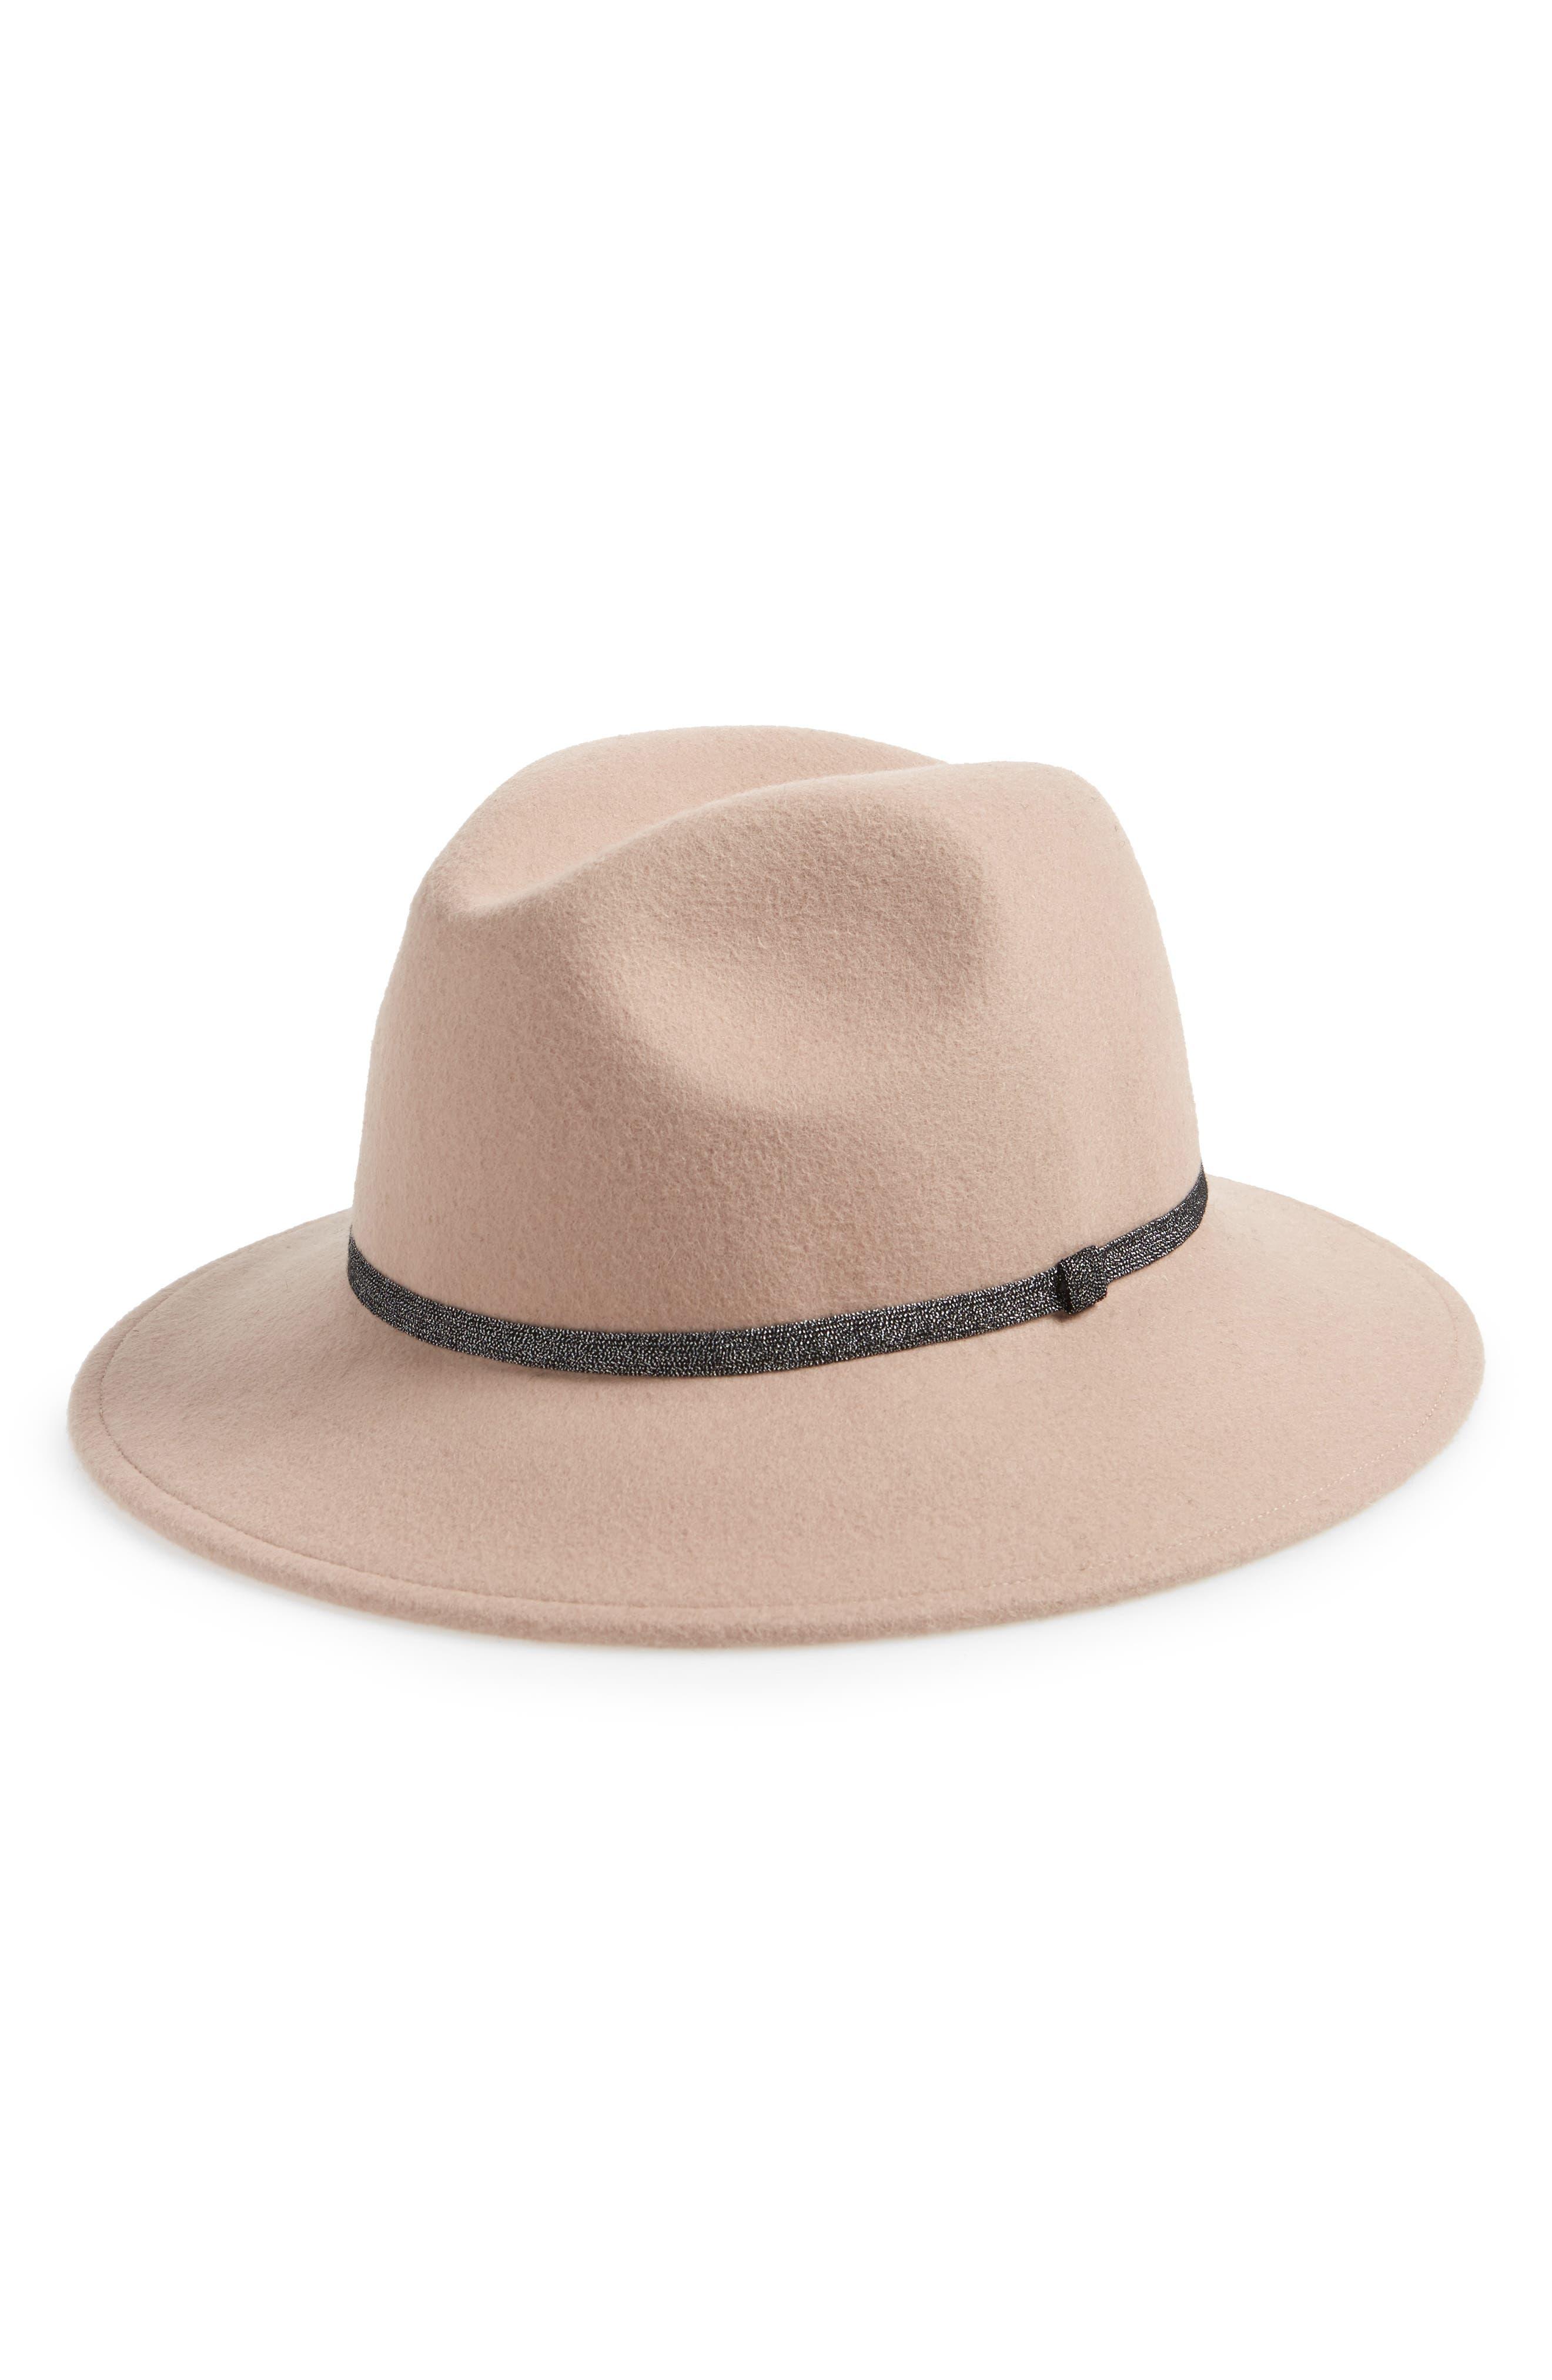 TREASURE & BOND Metallic Band Wool Felt Panama Hat, Main, color, 630